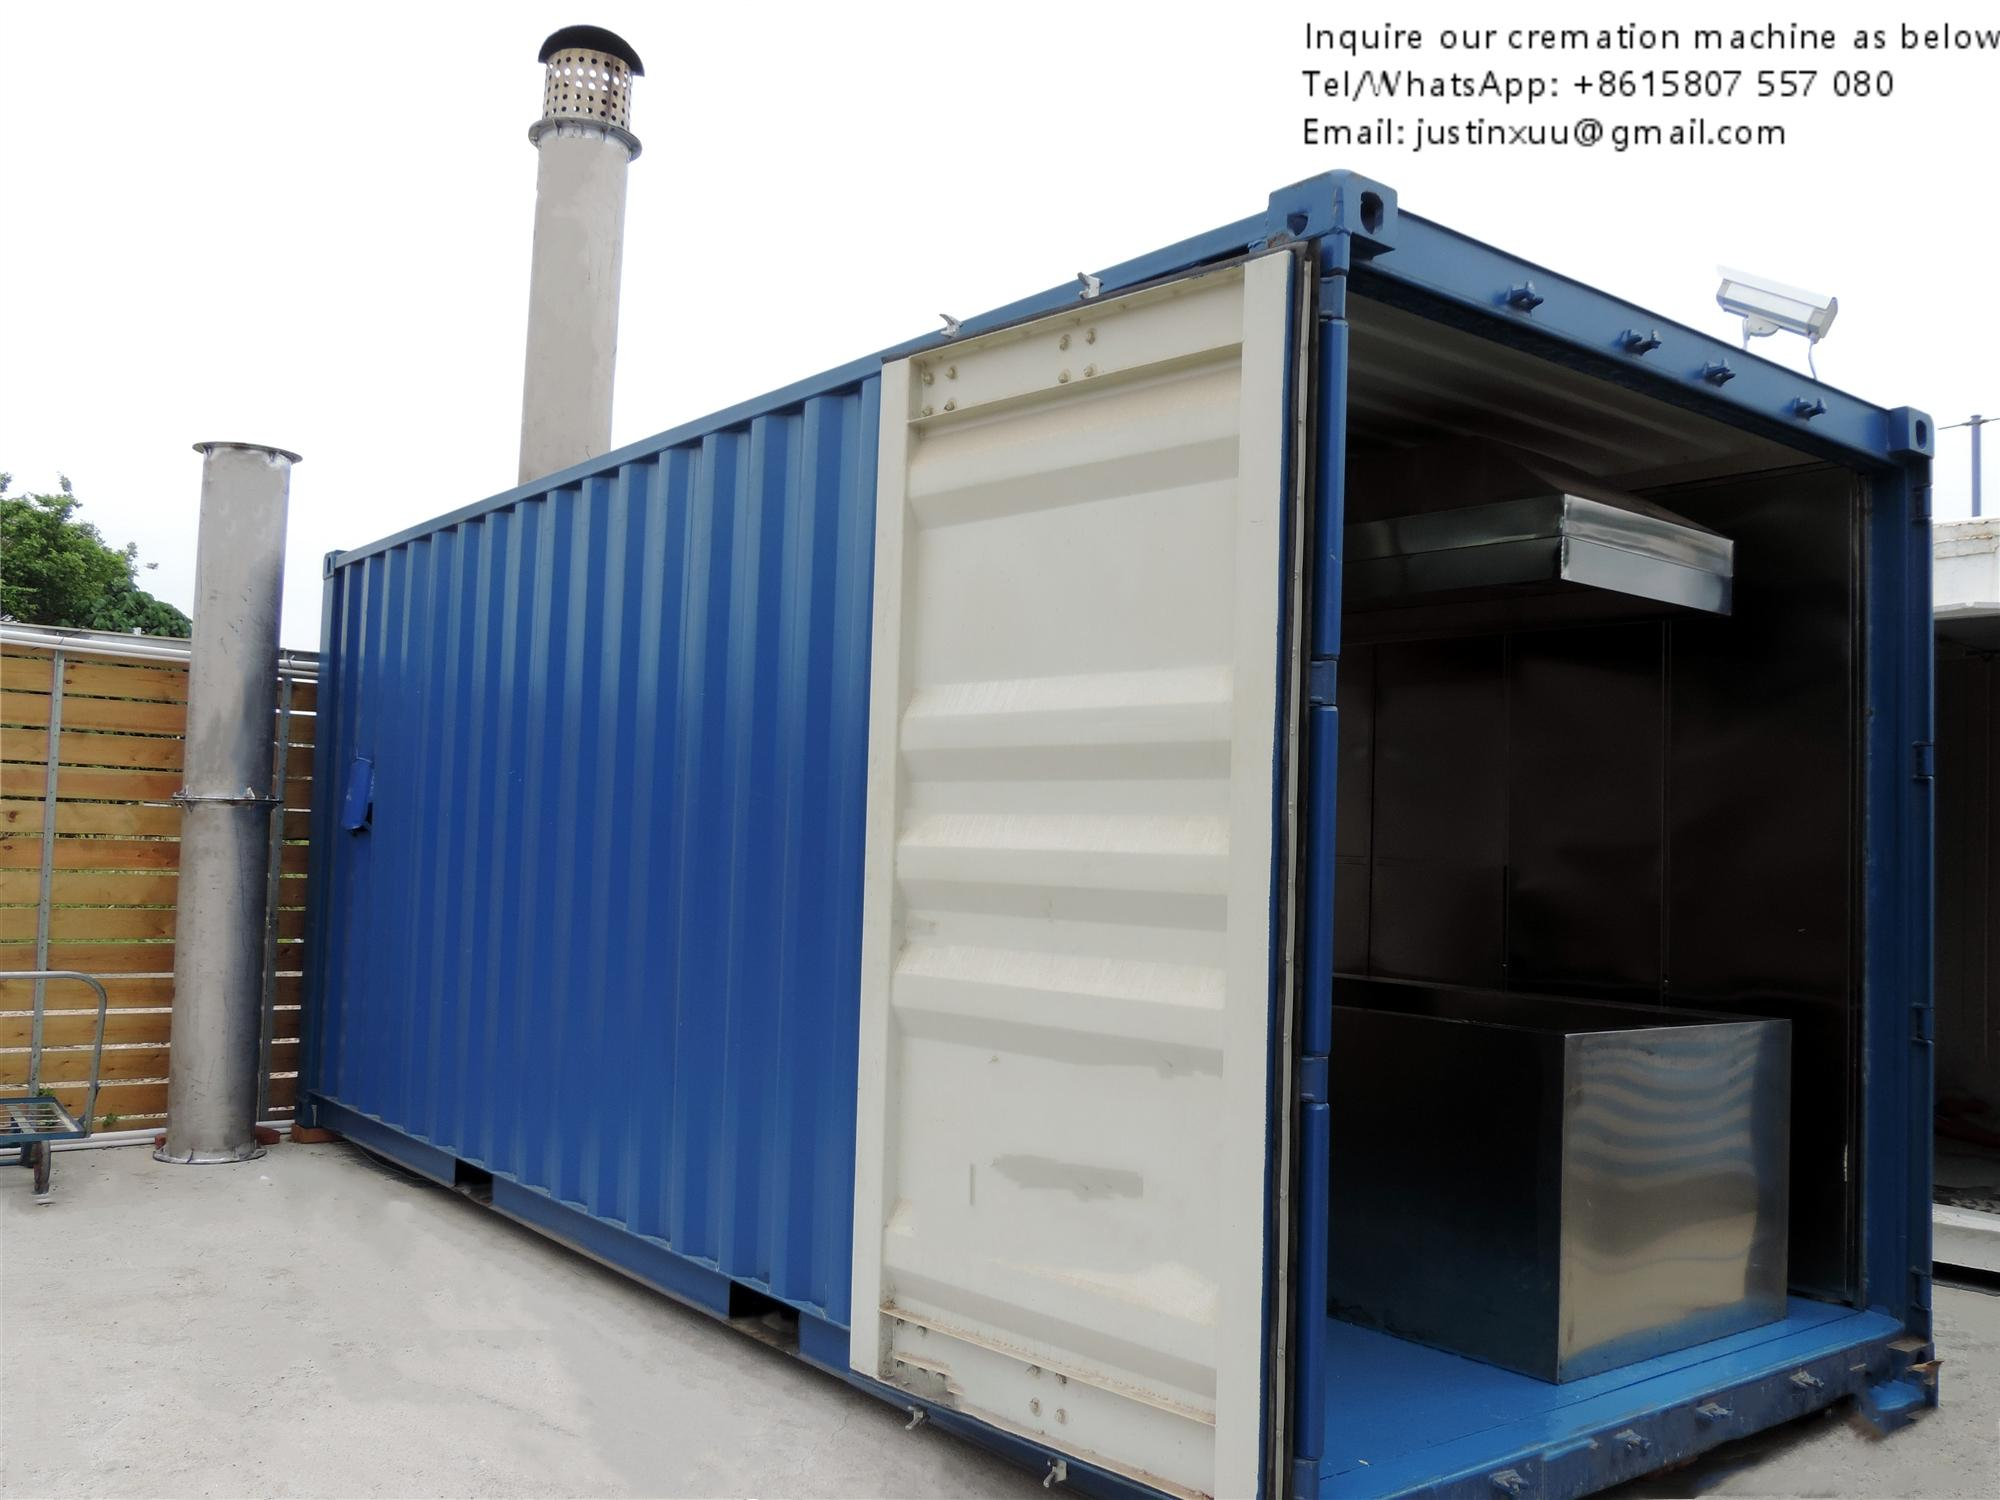 truck trailer crematorium machine emergency lorry designed for Russia market  3